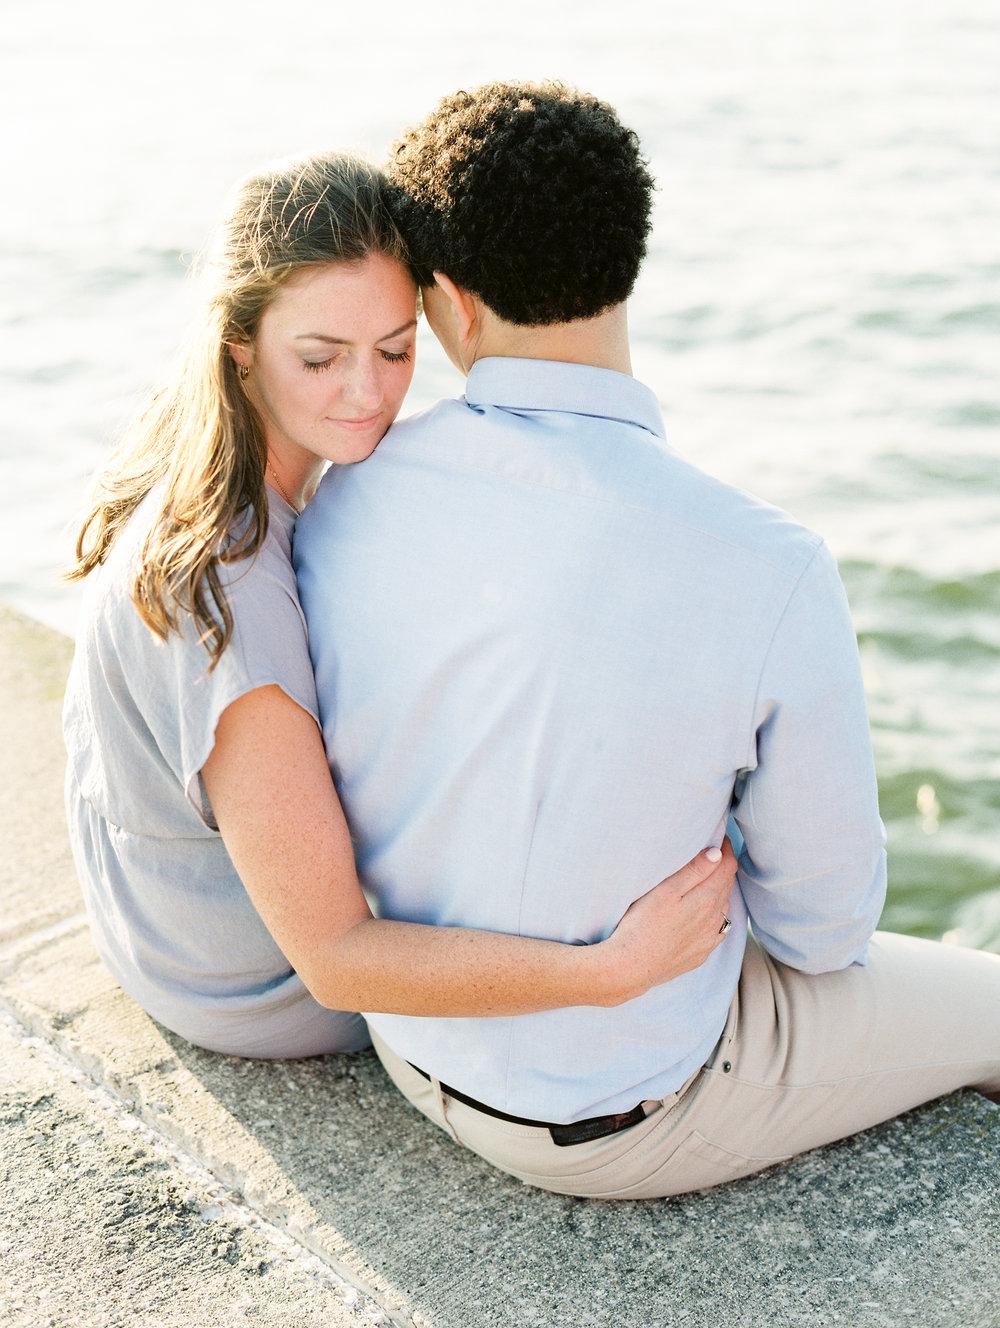 Lucie+Anthony+Engaged-55.jpg